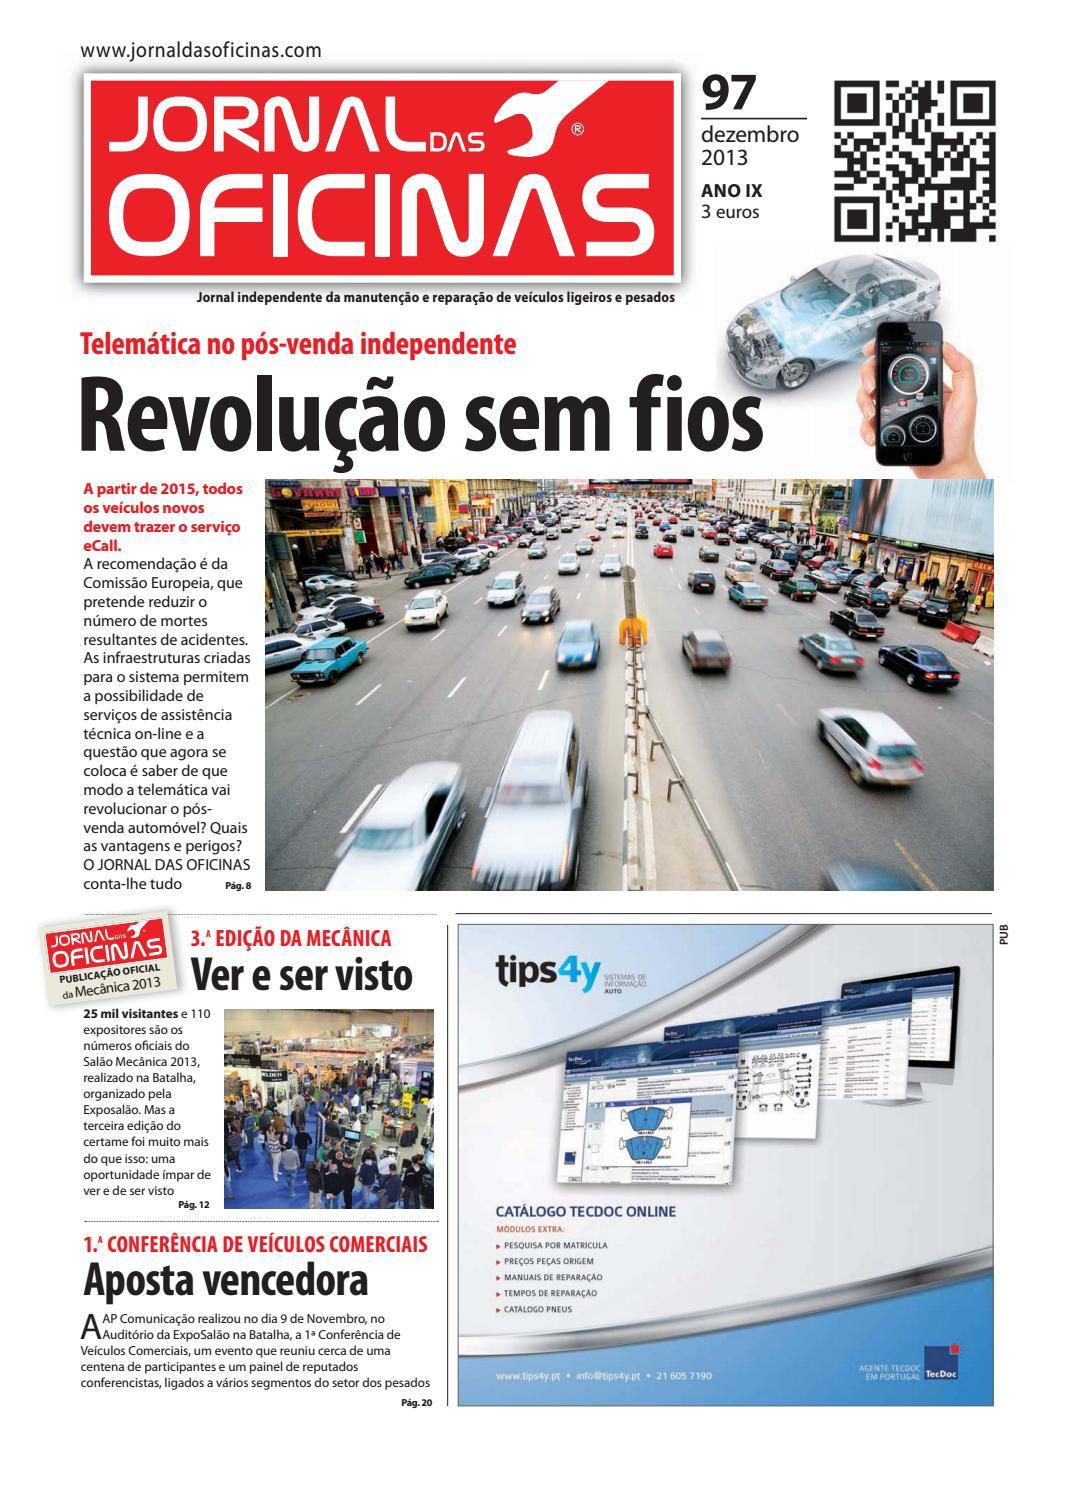 Jo097lr by Jornal das Oficinas - issuu